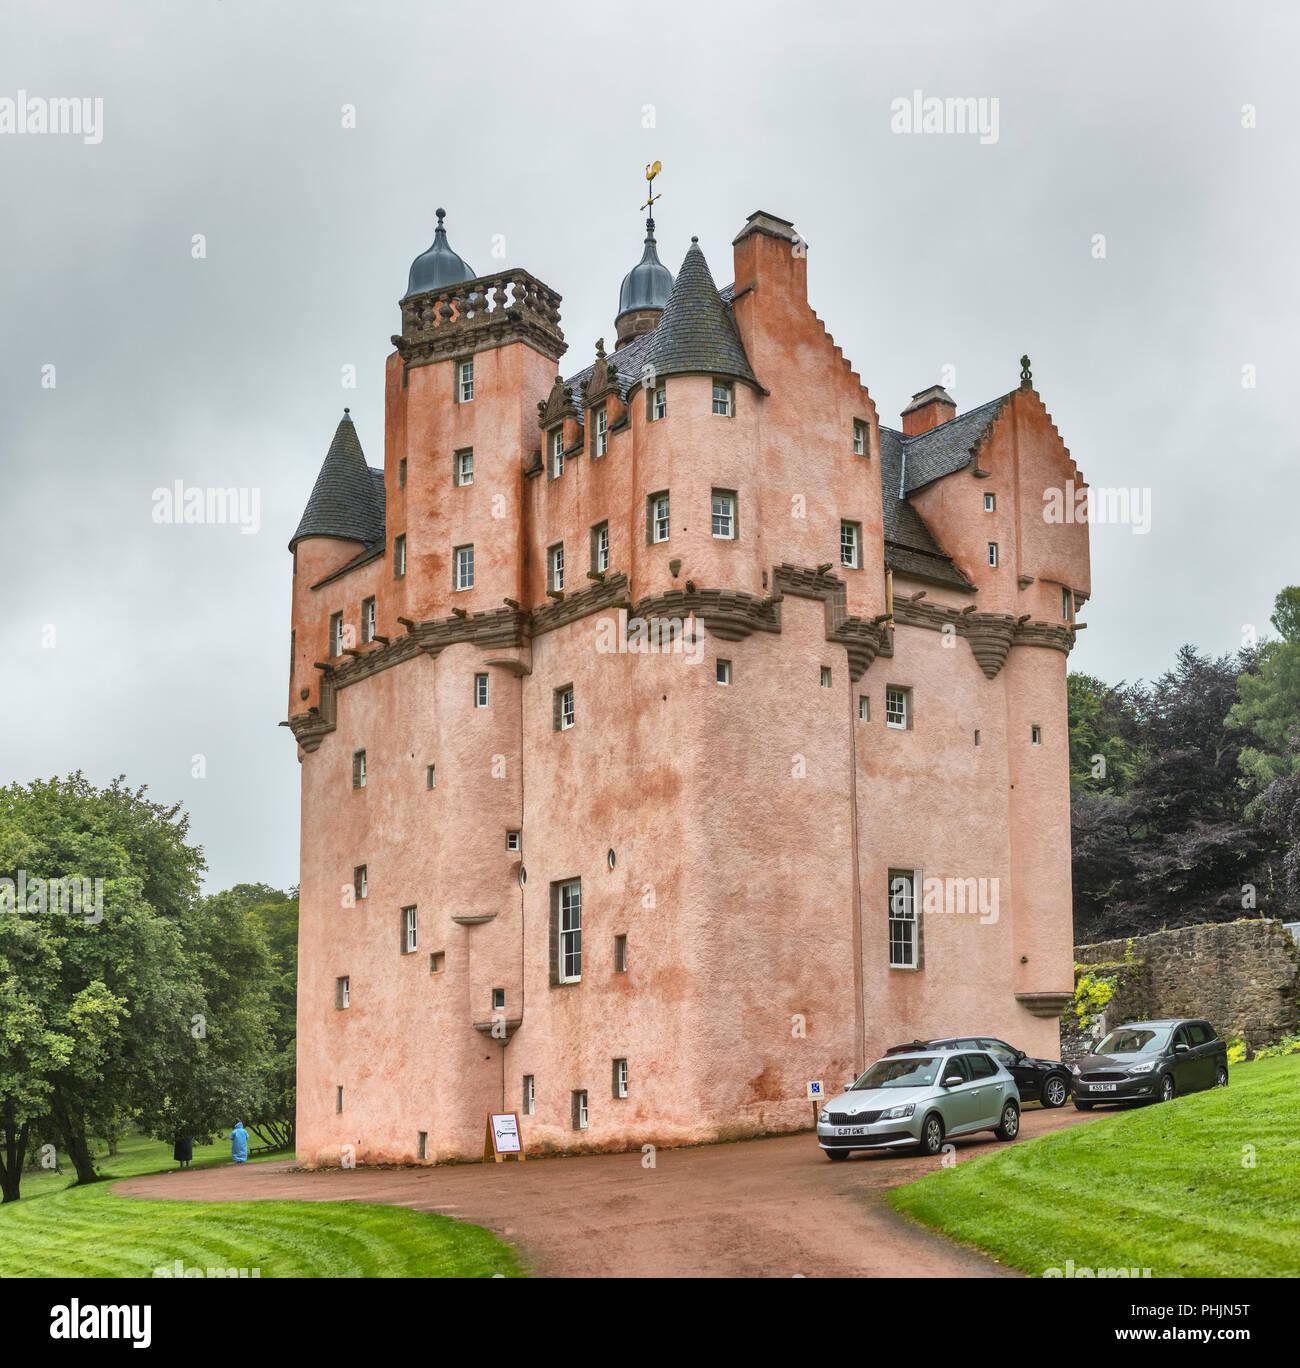 Craigievar castle (1626), Aberdeenshire, Scotland, UK - Stock Image